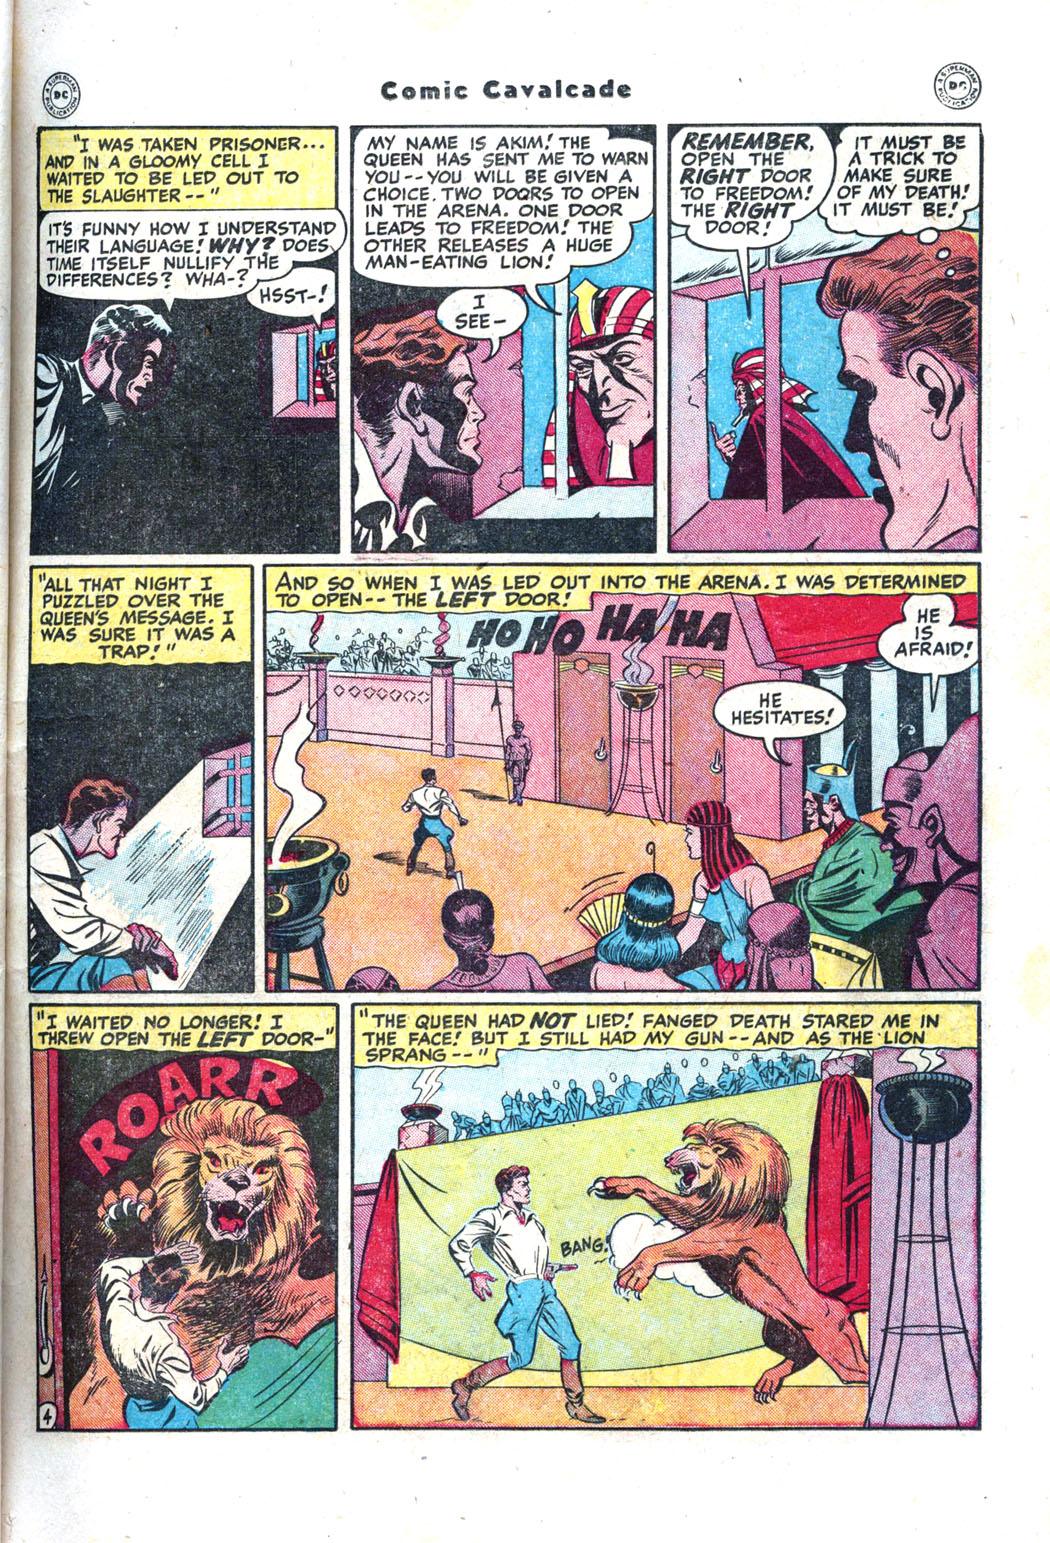 Comic Cavalcade issue 26 - Page 21